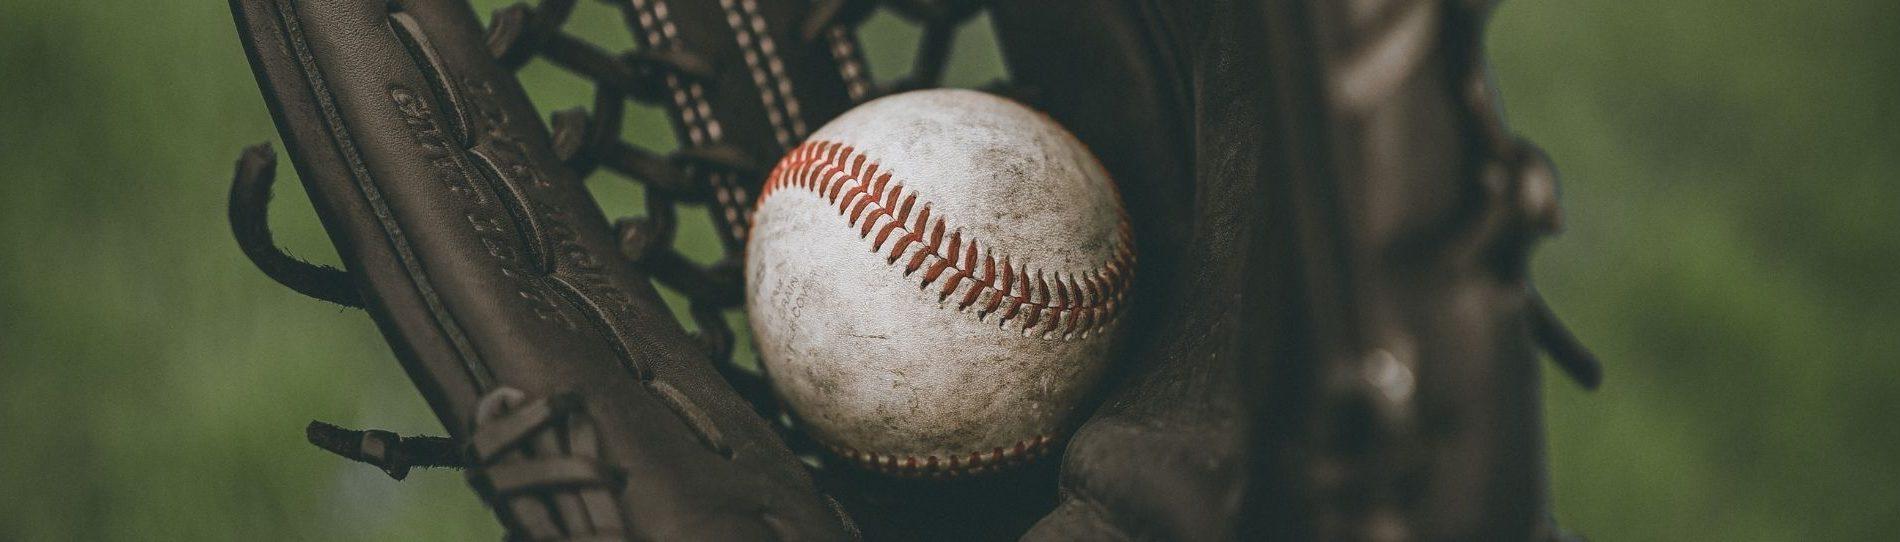 team trips baseball end of season trip